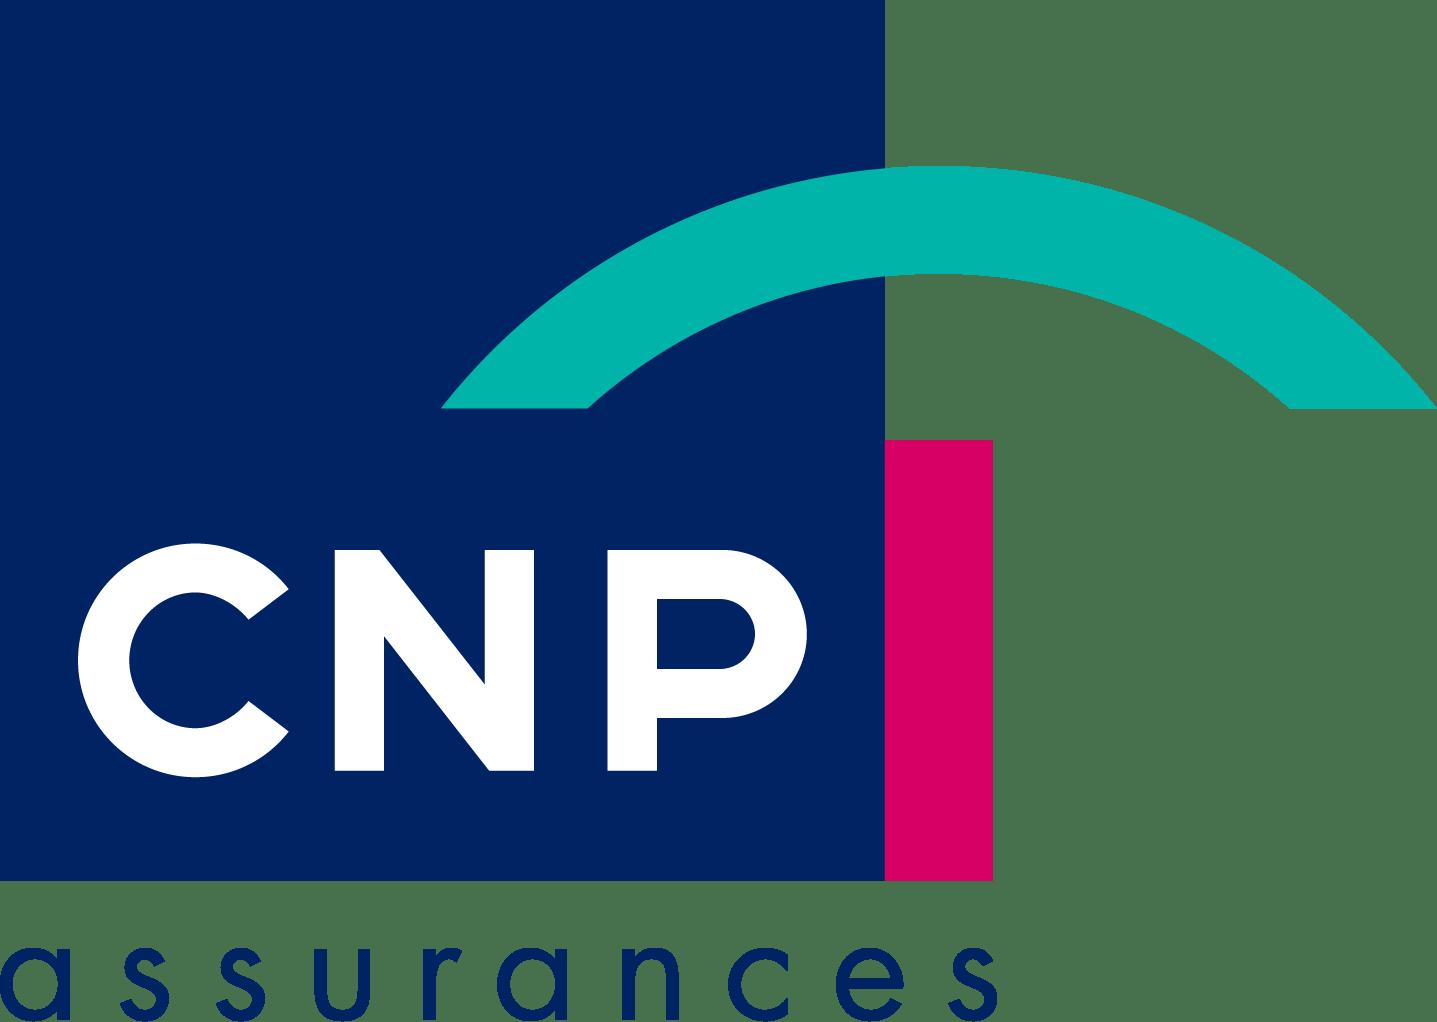 CNP Assurances Logo png